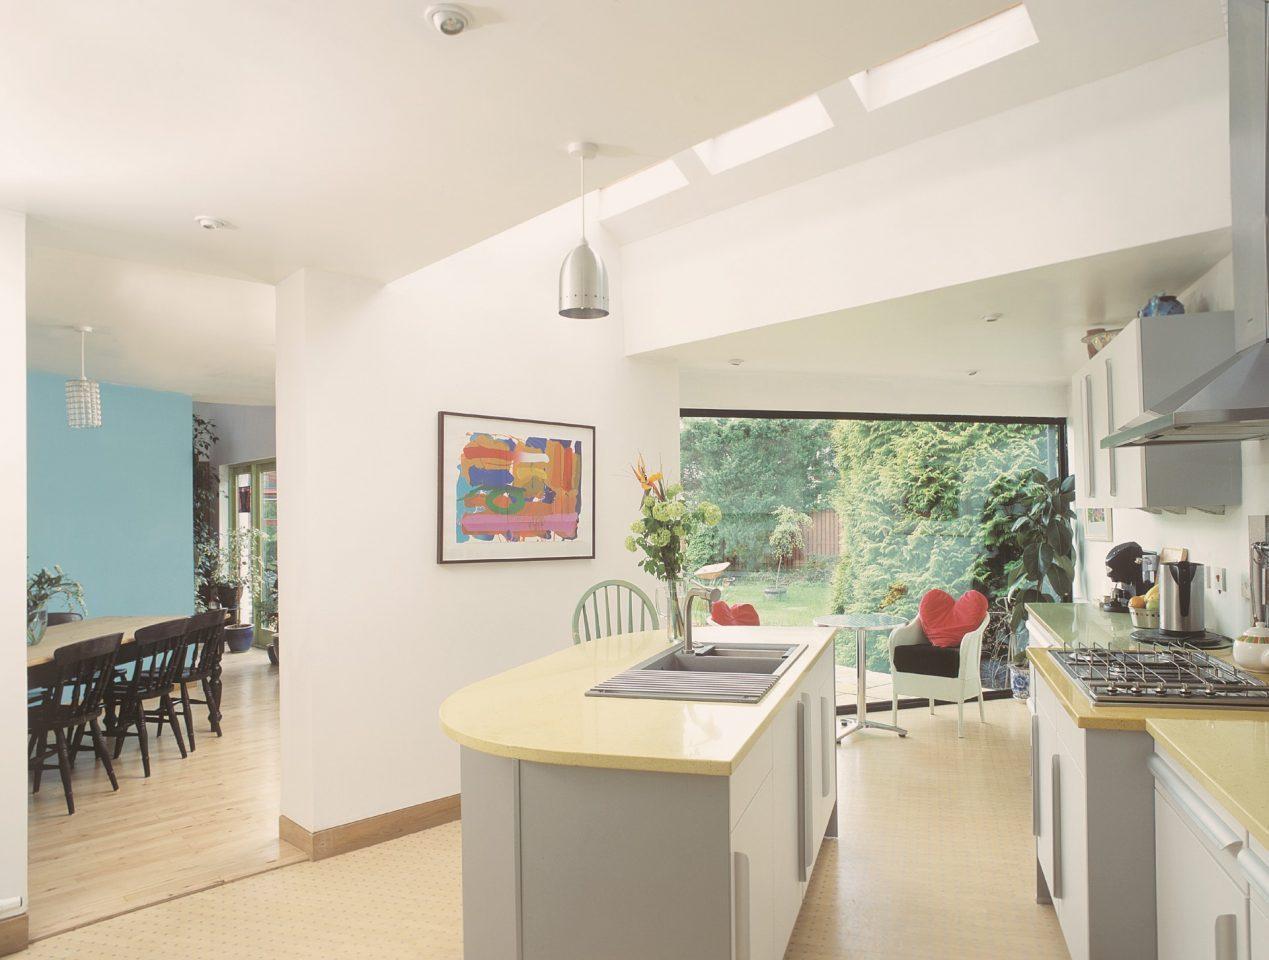 Cucine Per Mansarde Basse. Affordable Studio O Camera Aggiuntiva Nel ...